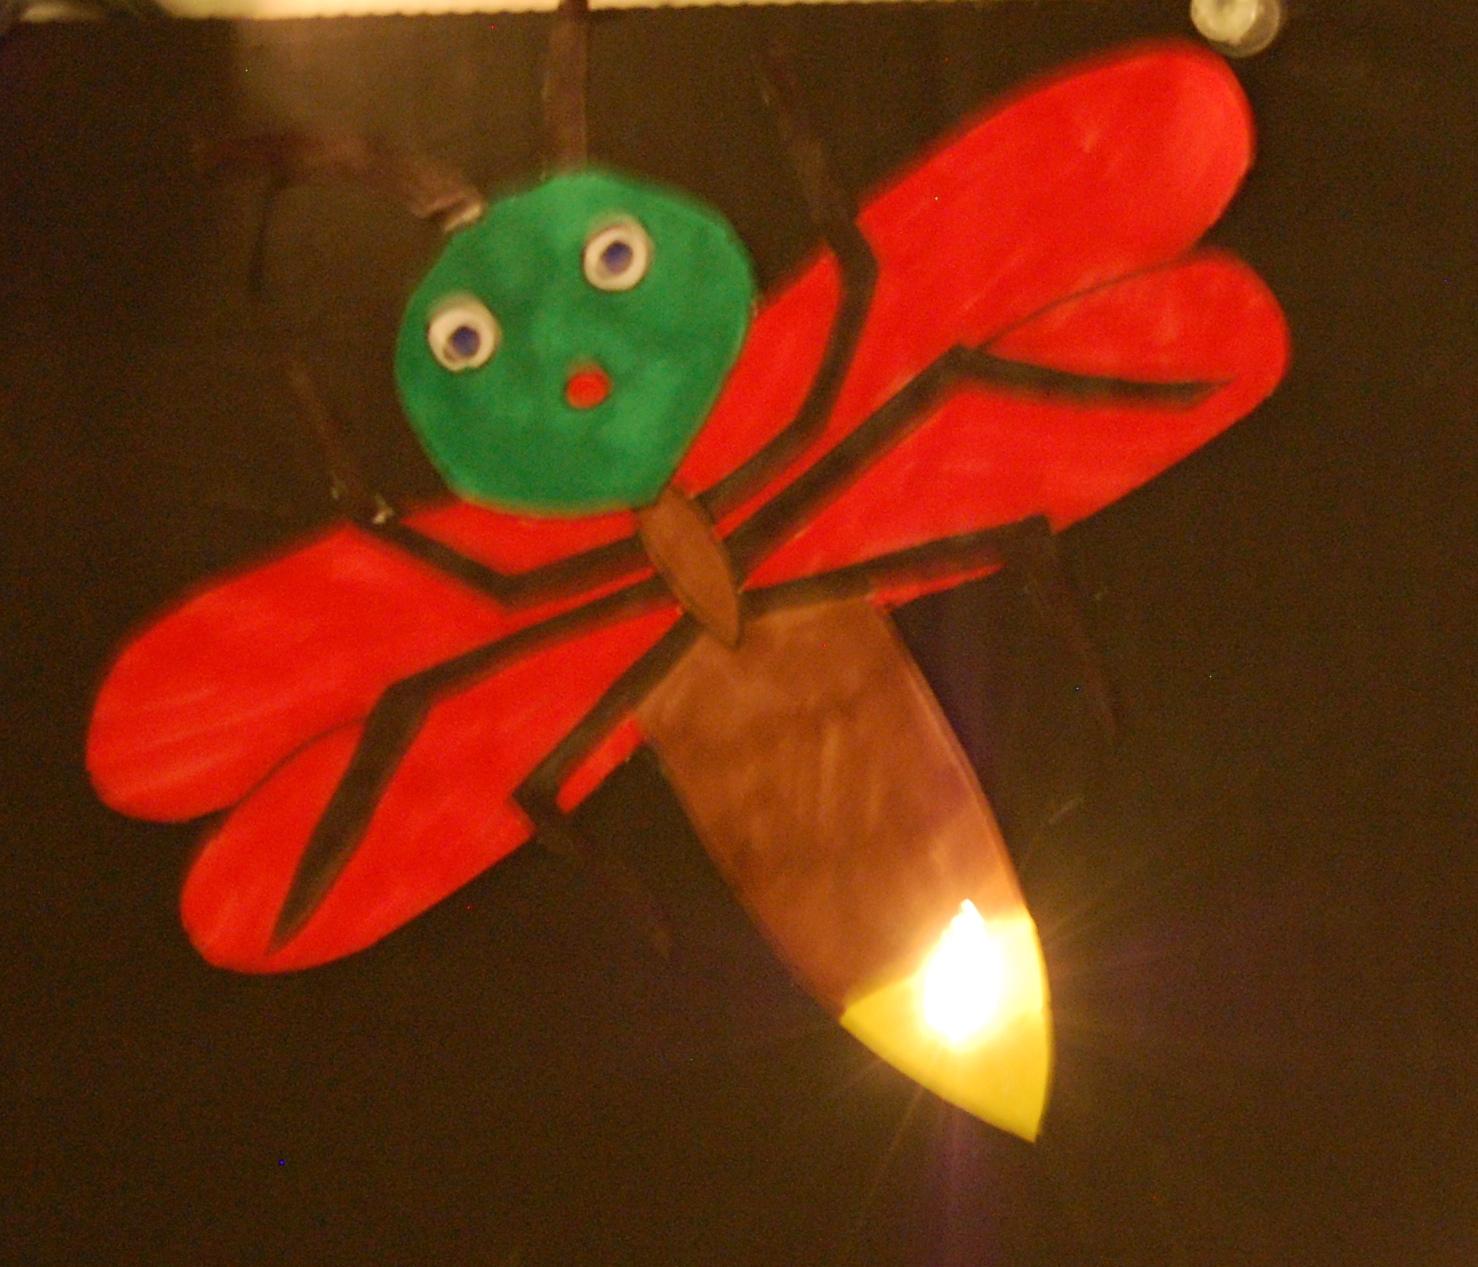 Firefly Art Project